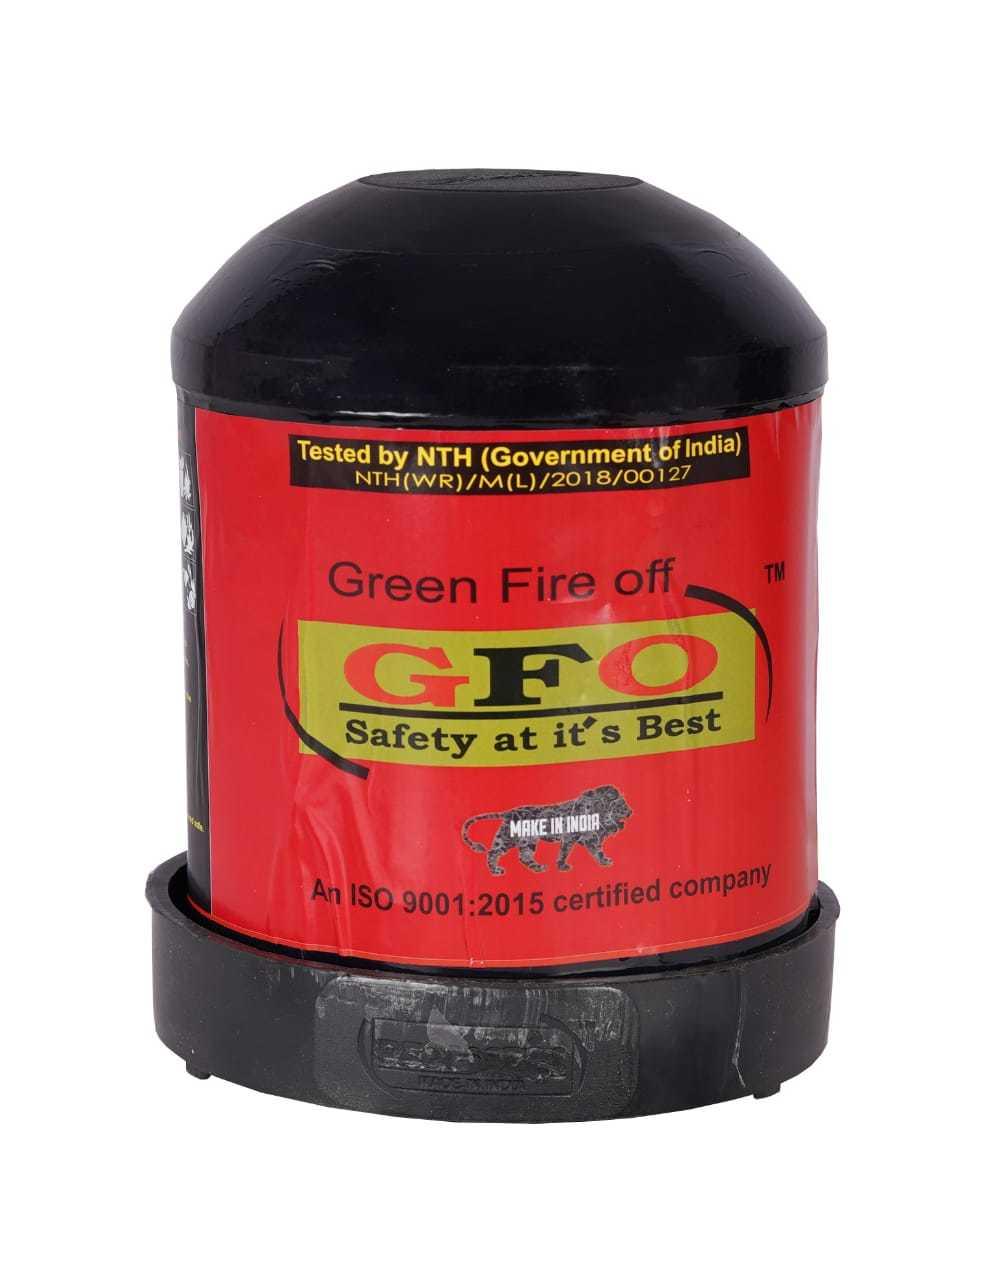 1.3 Kg Automatic Fire Extinguisher Drum